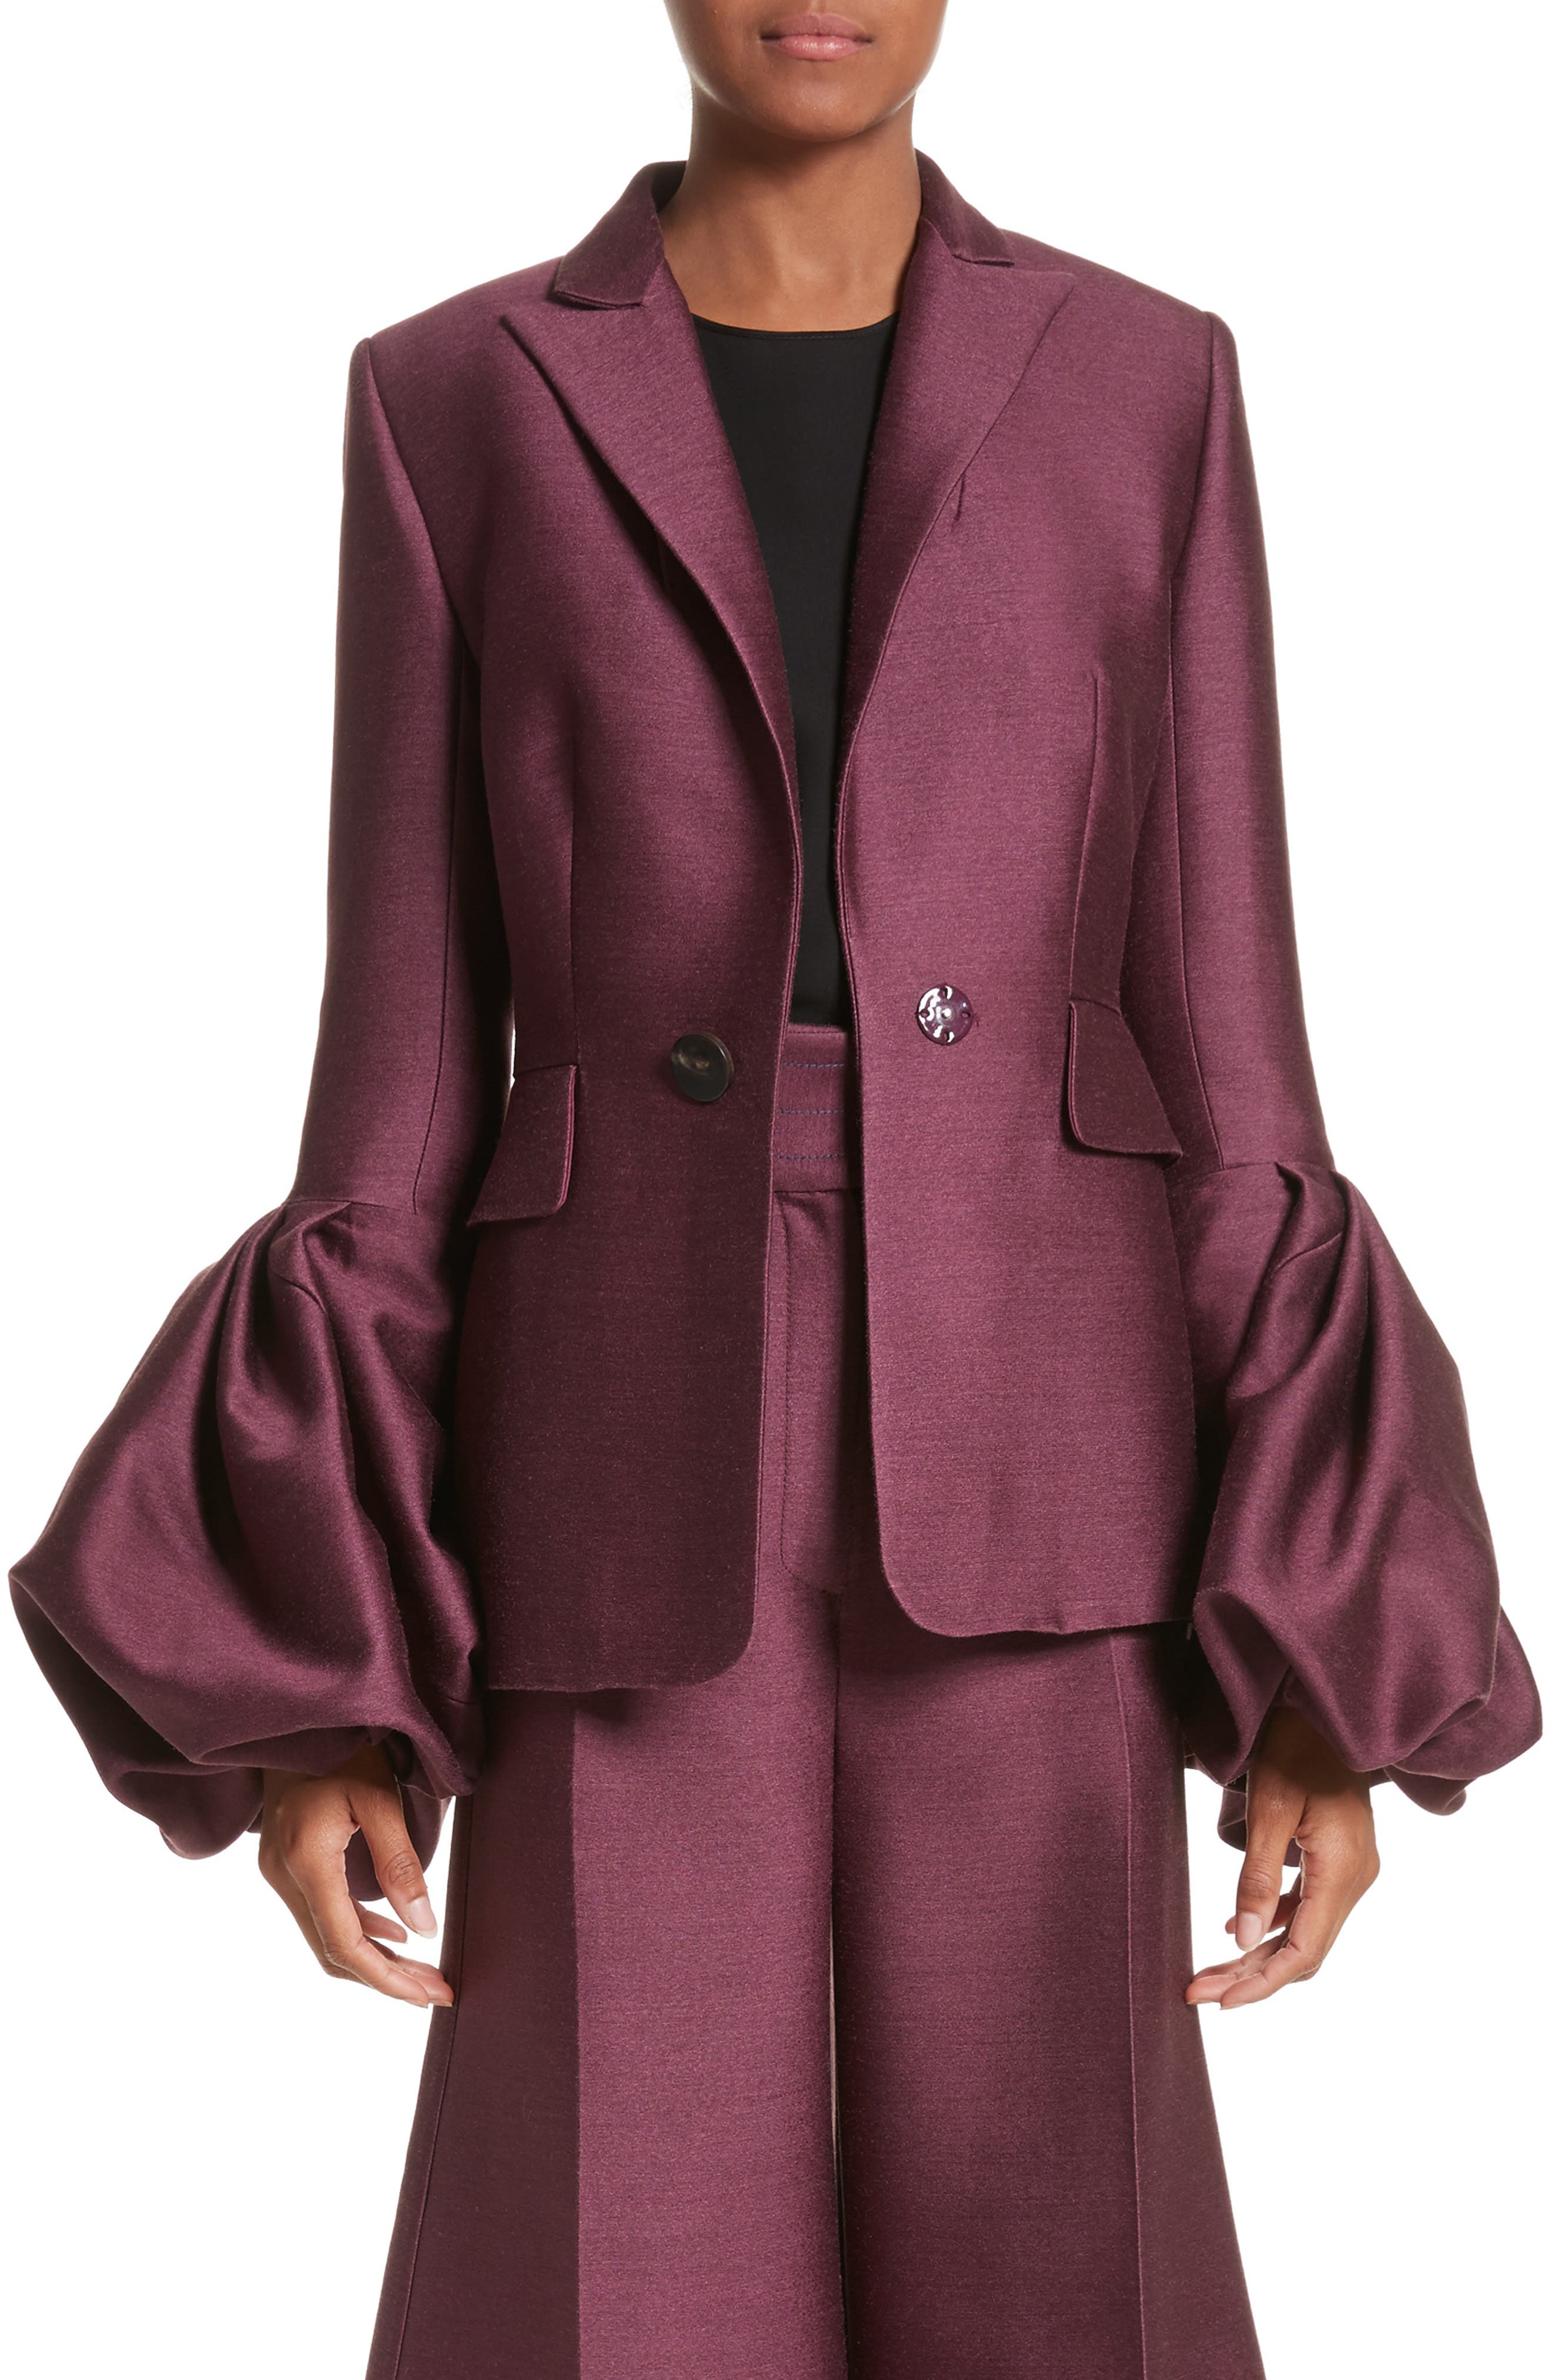 Narika Wool & Silk Jacket,                             Main thumbnail 1, color,                             Plum